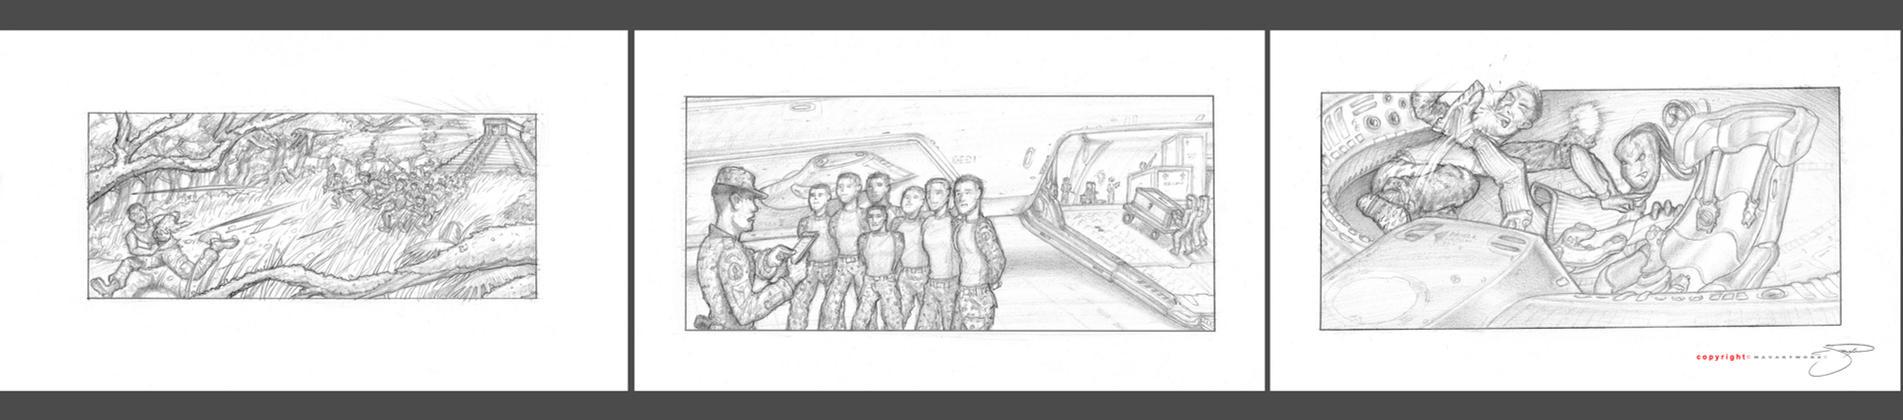 Jr Crew Concept Boards I by mavartworx